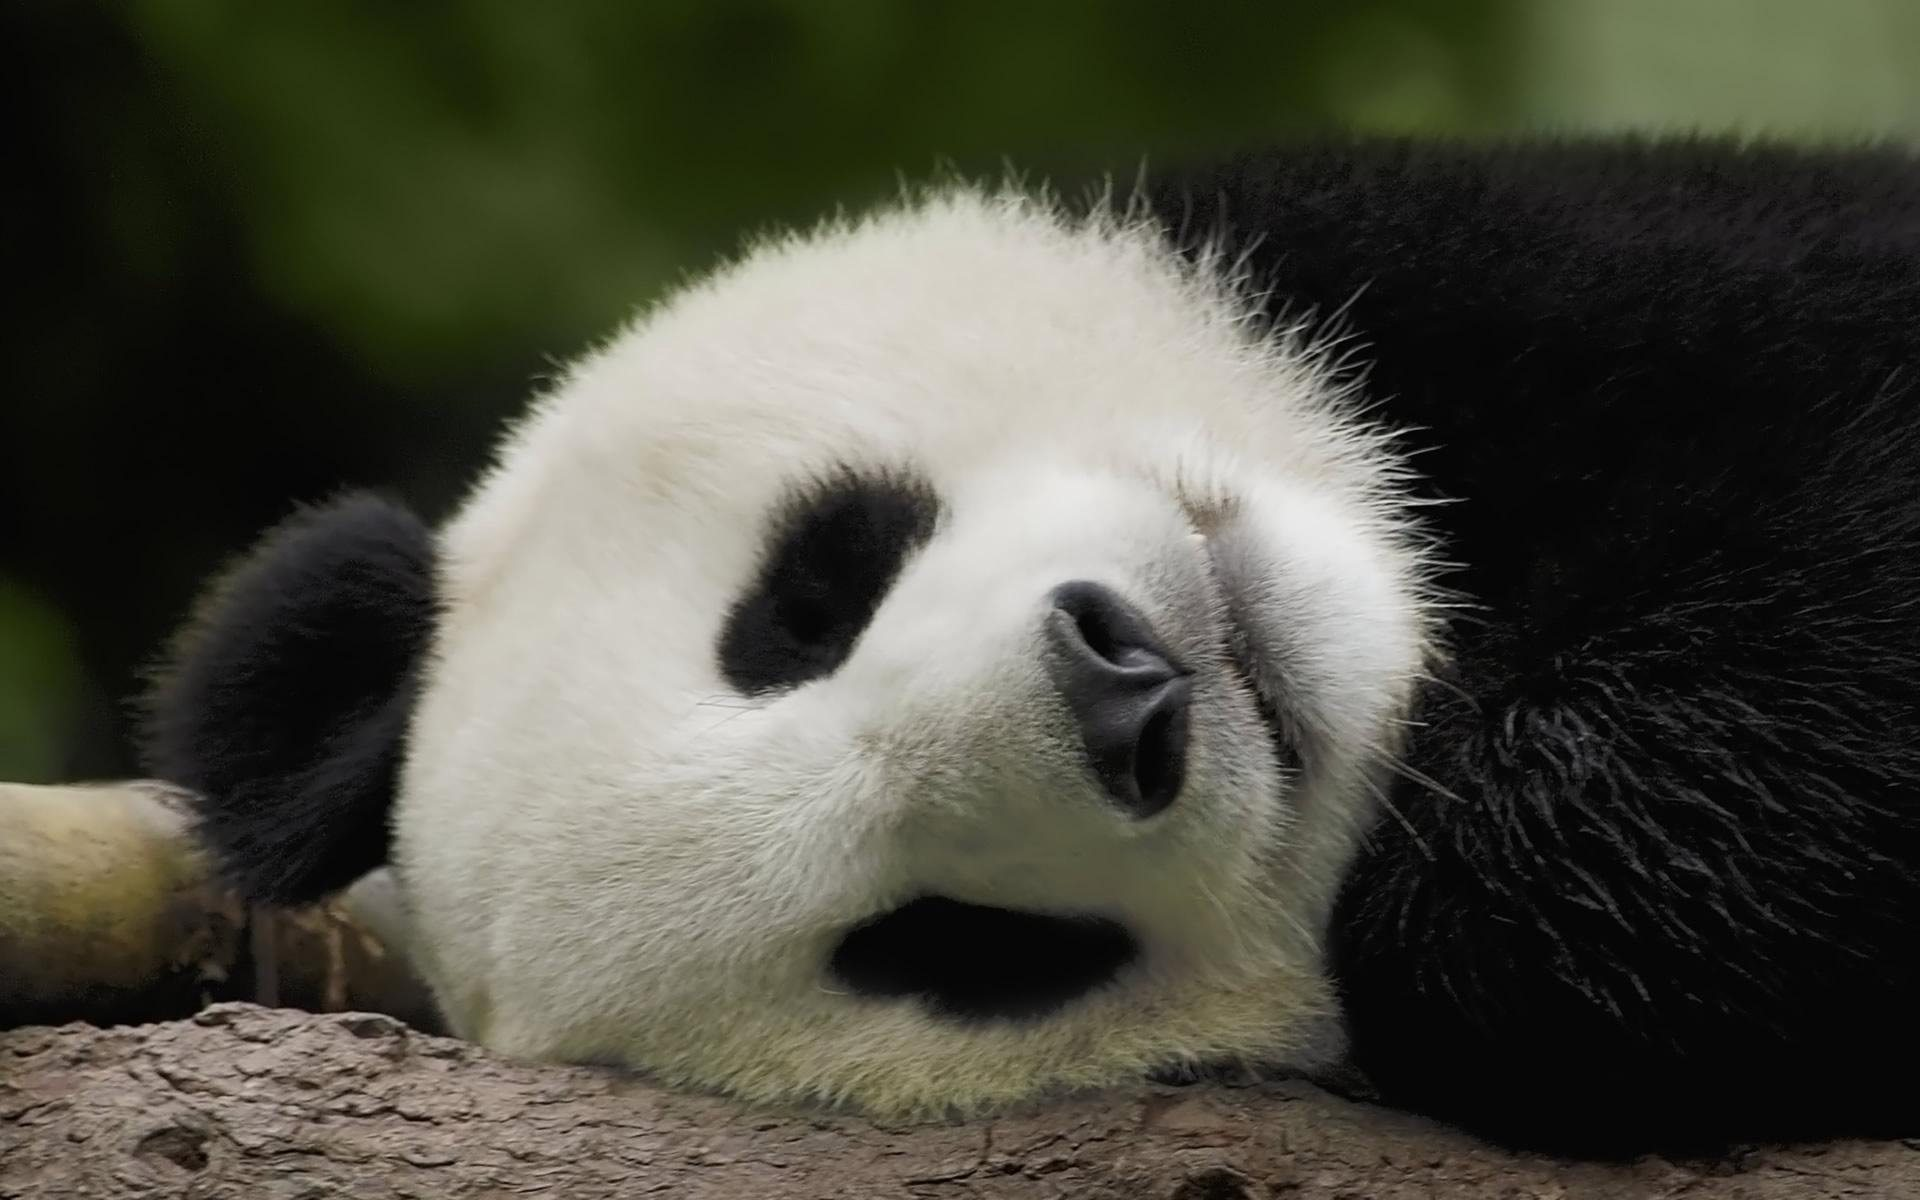 Photo of giant panda - China Tours